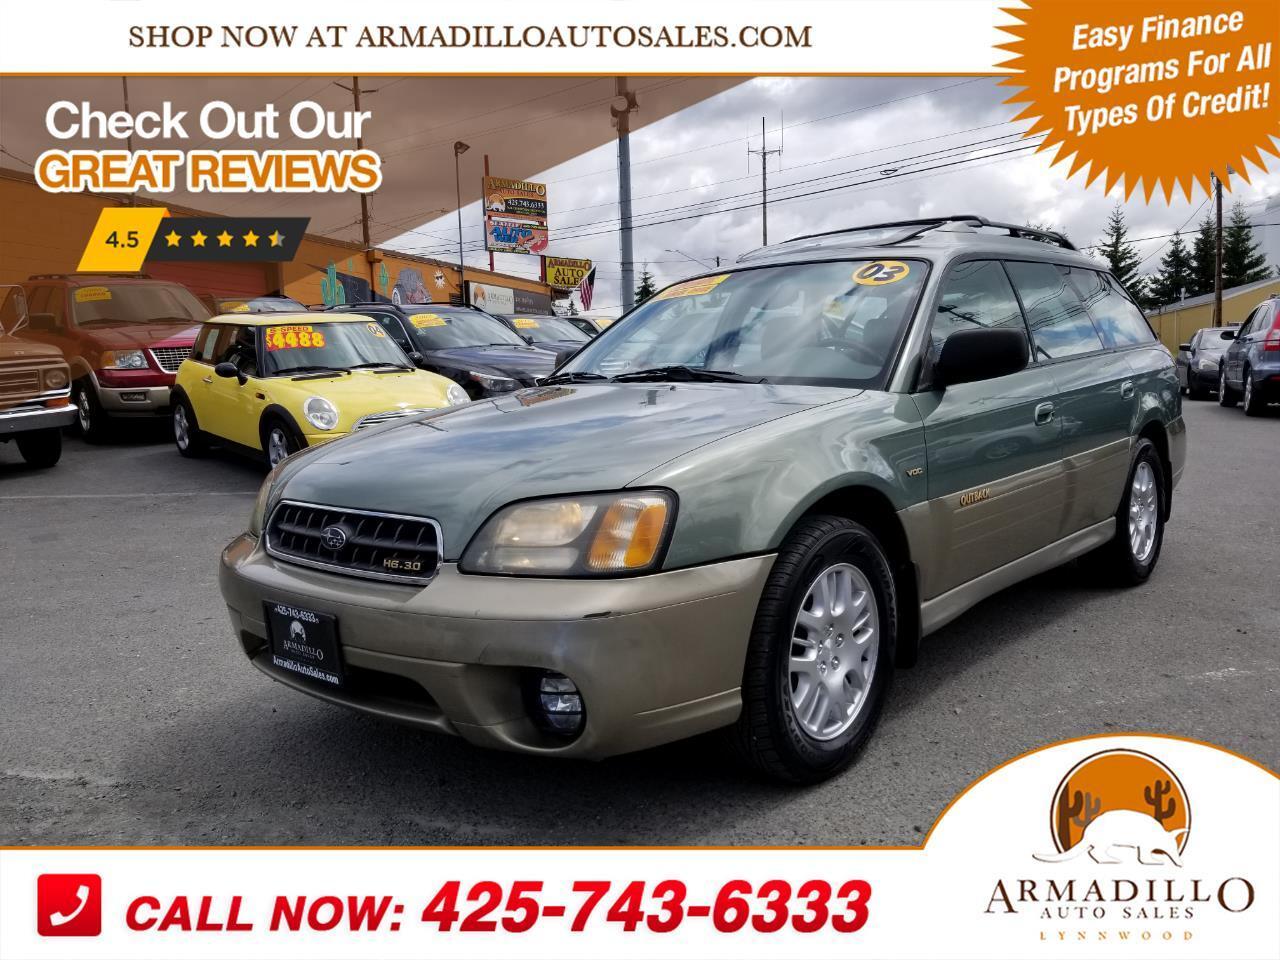 2003 Subaru Outback H6-3.0 VDC Wagon